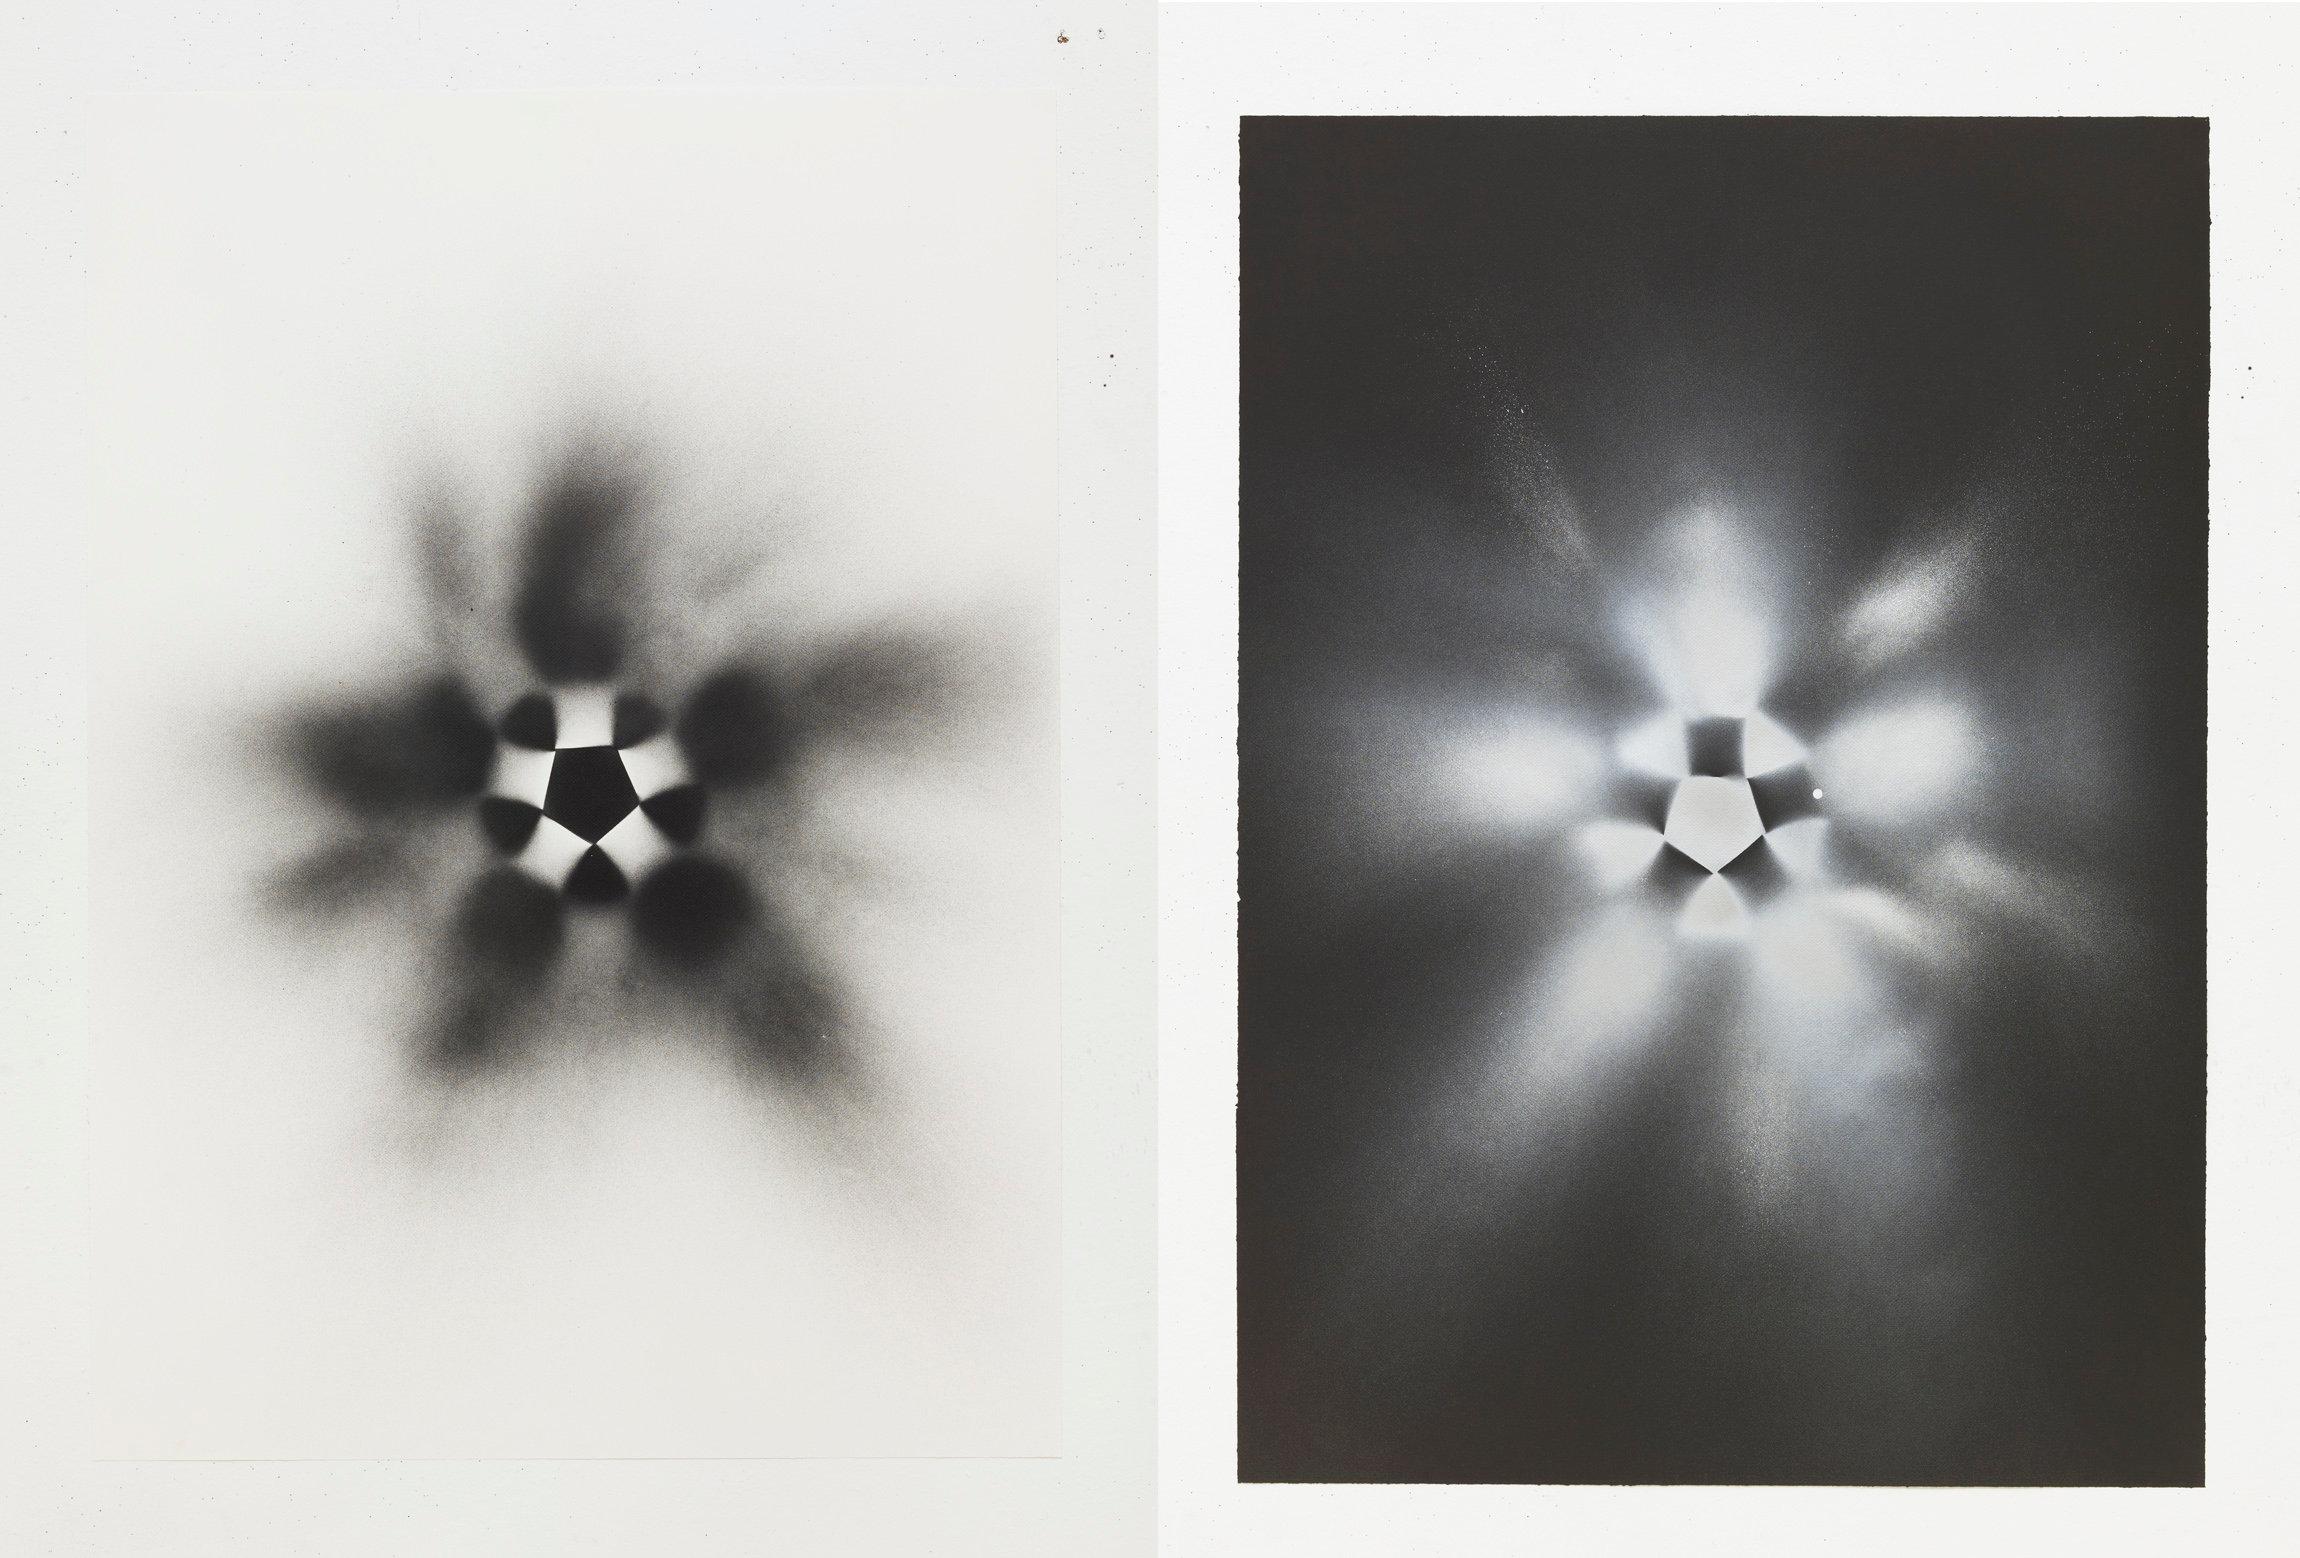 Non-Foldings – Cosmic Explosion #4